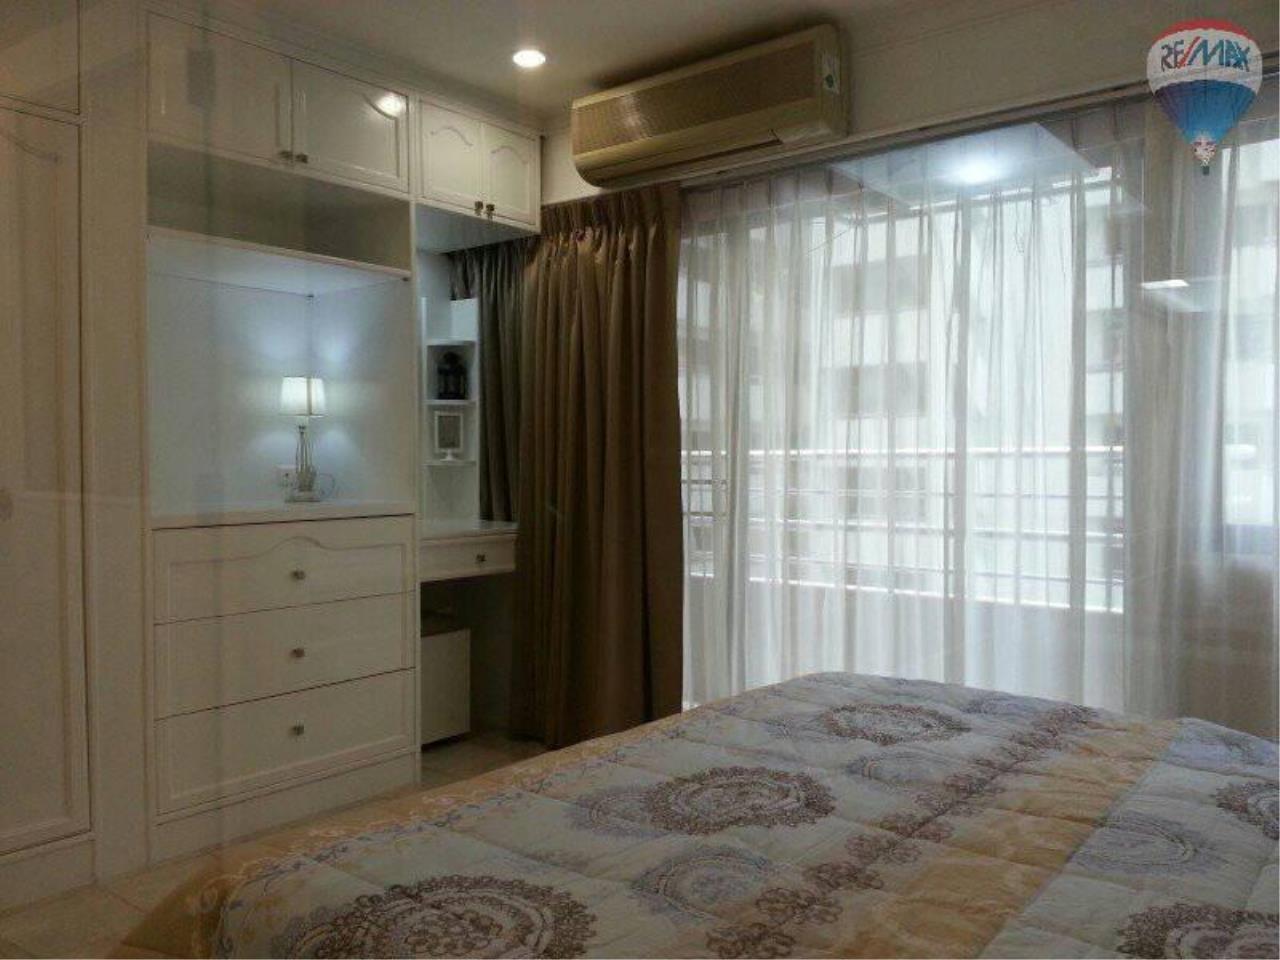 RE/MAX Properties Agency's 1 Bedroom 60 Sq.m for RENT at Saranjai Mansion,Sukhumvit Soi 4 (Nana) 9